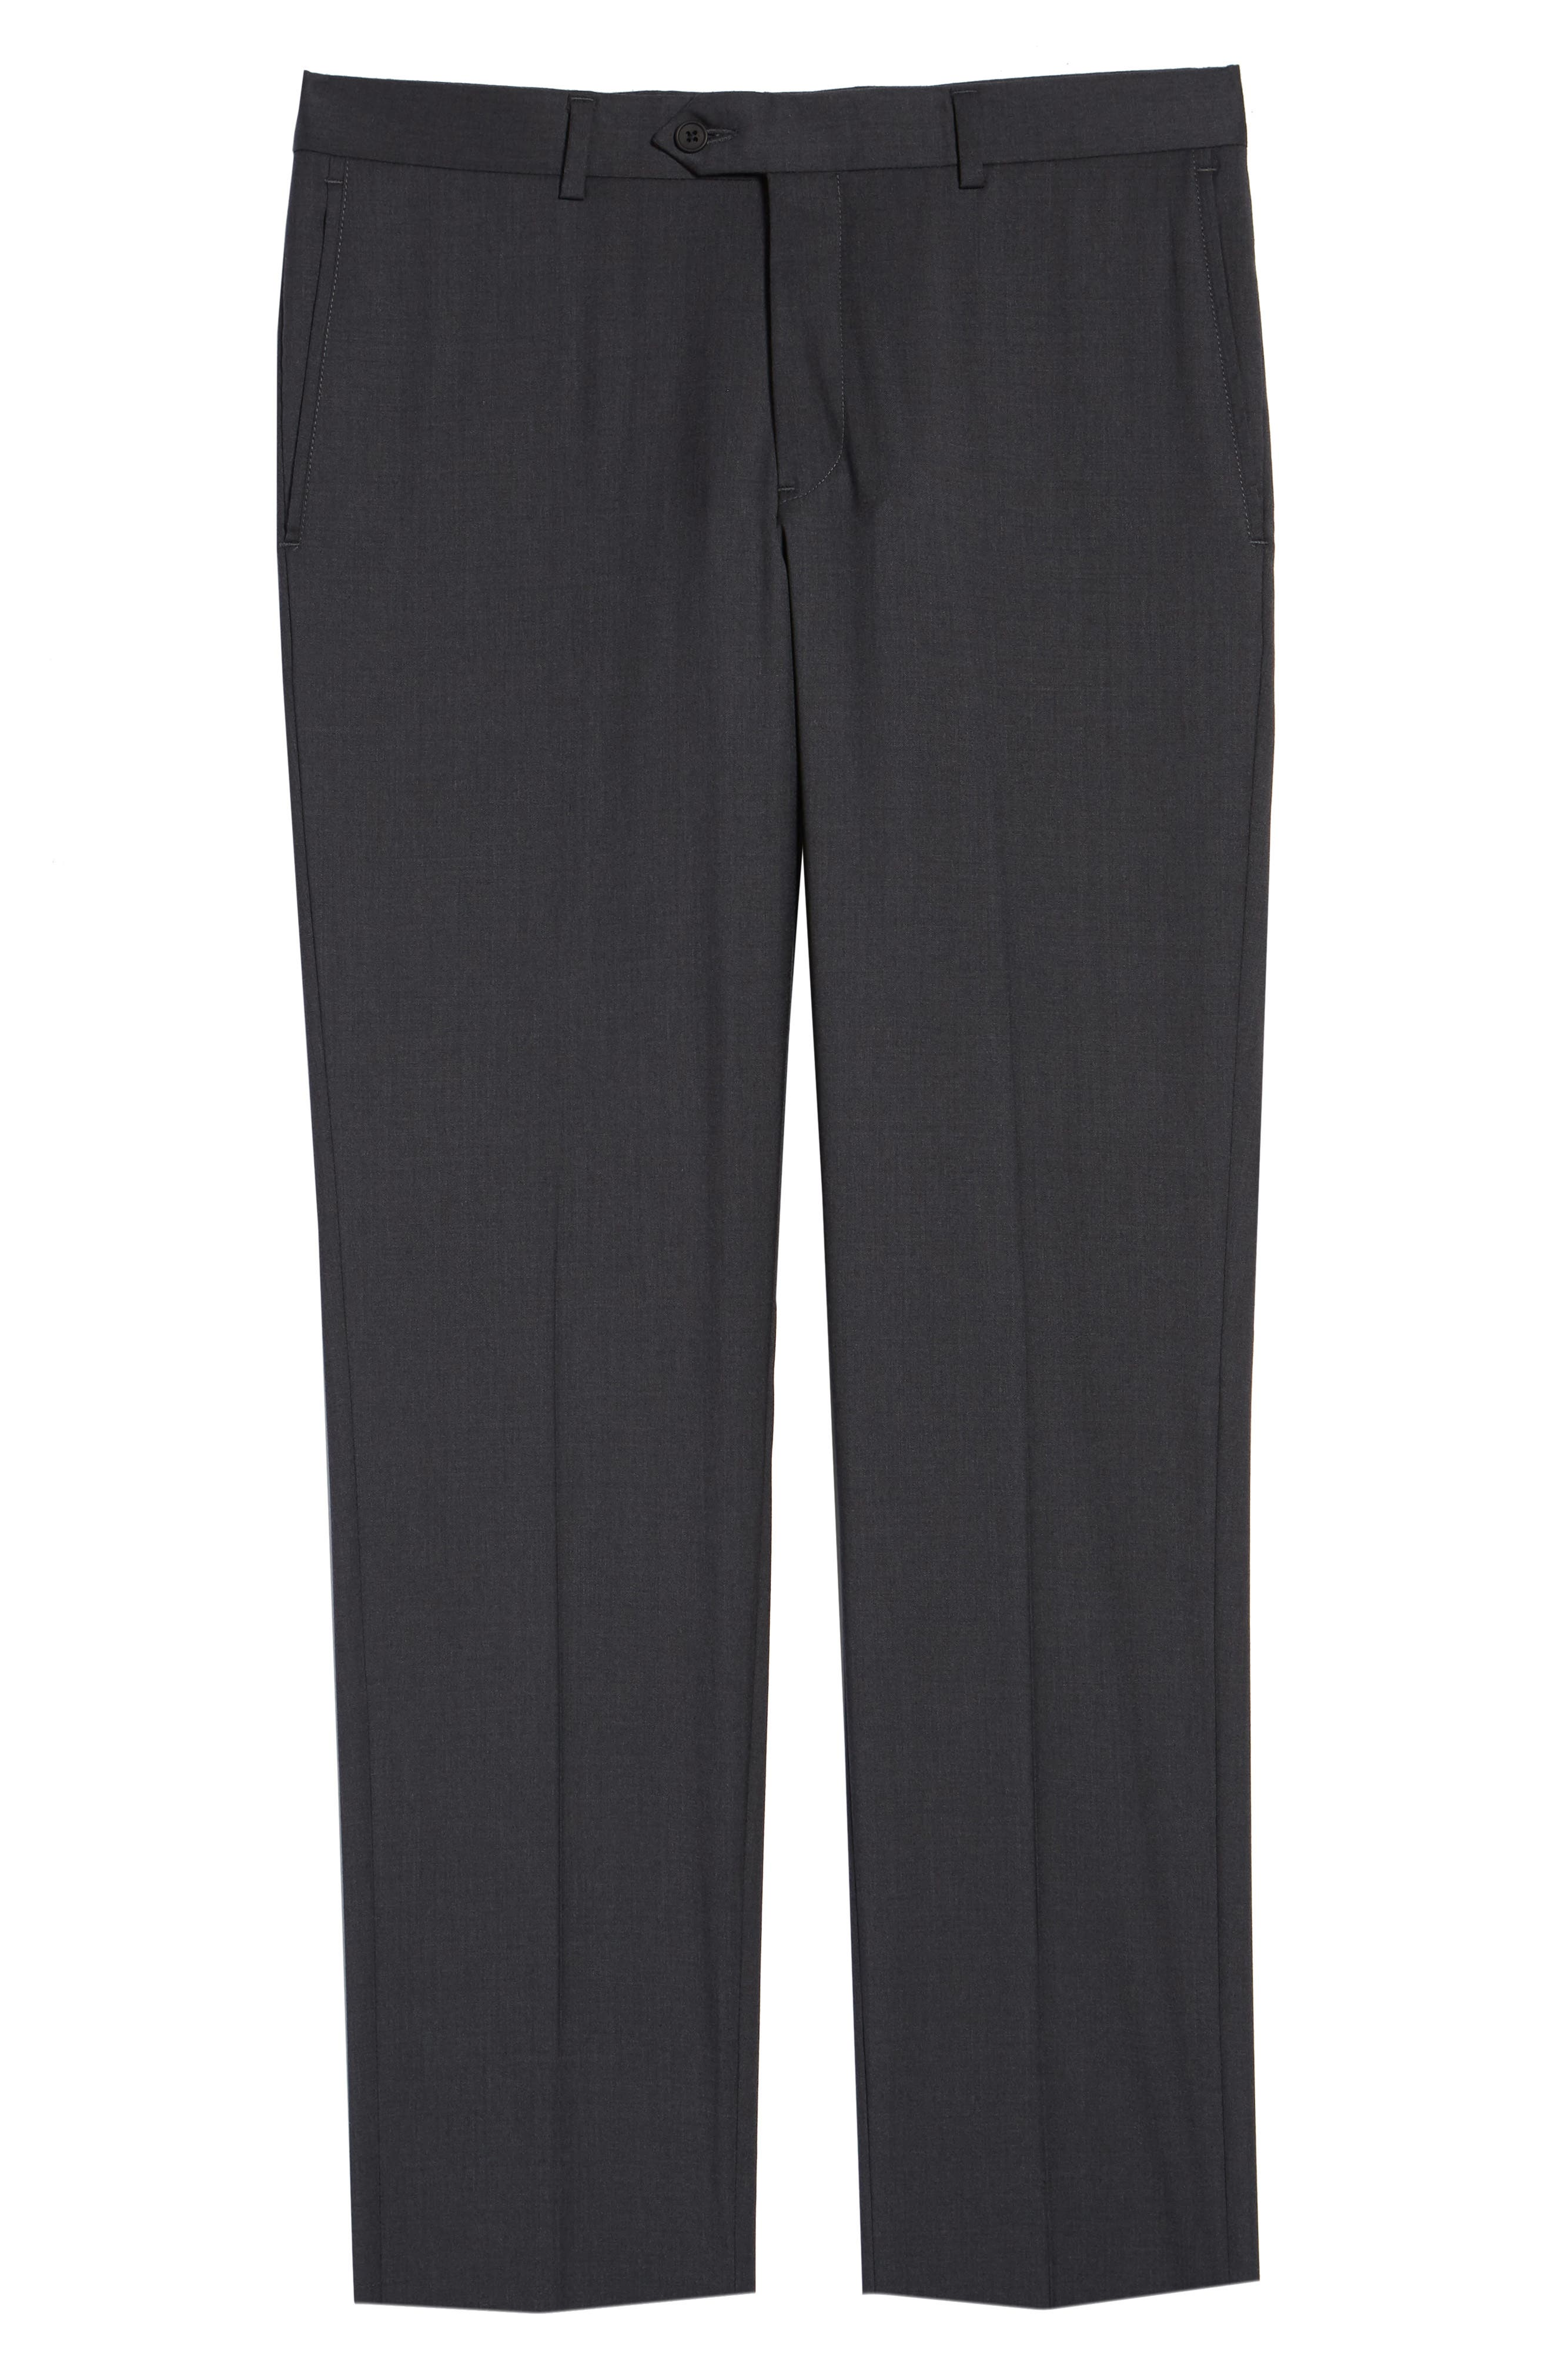 NORDSTROM MEN'S SHOP, Trim Fit Stretch Wool Trousers, Alternate thumbnail 6, color, CHARCOAL